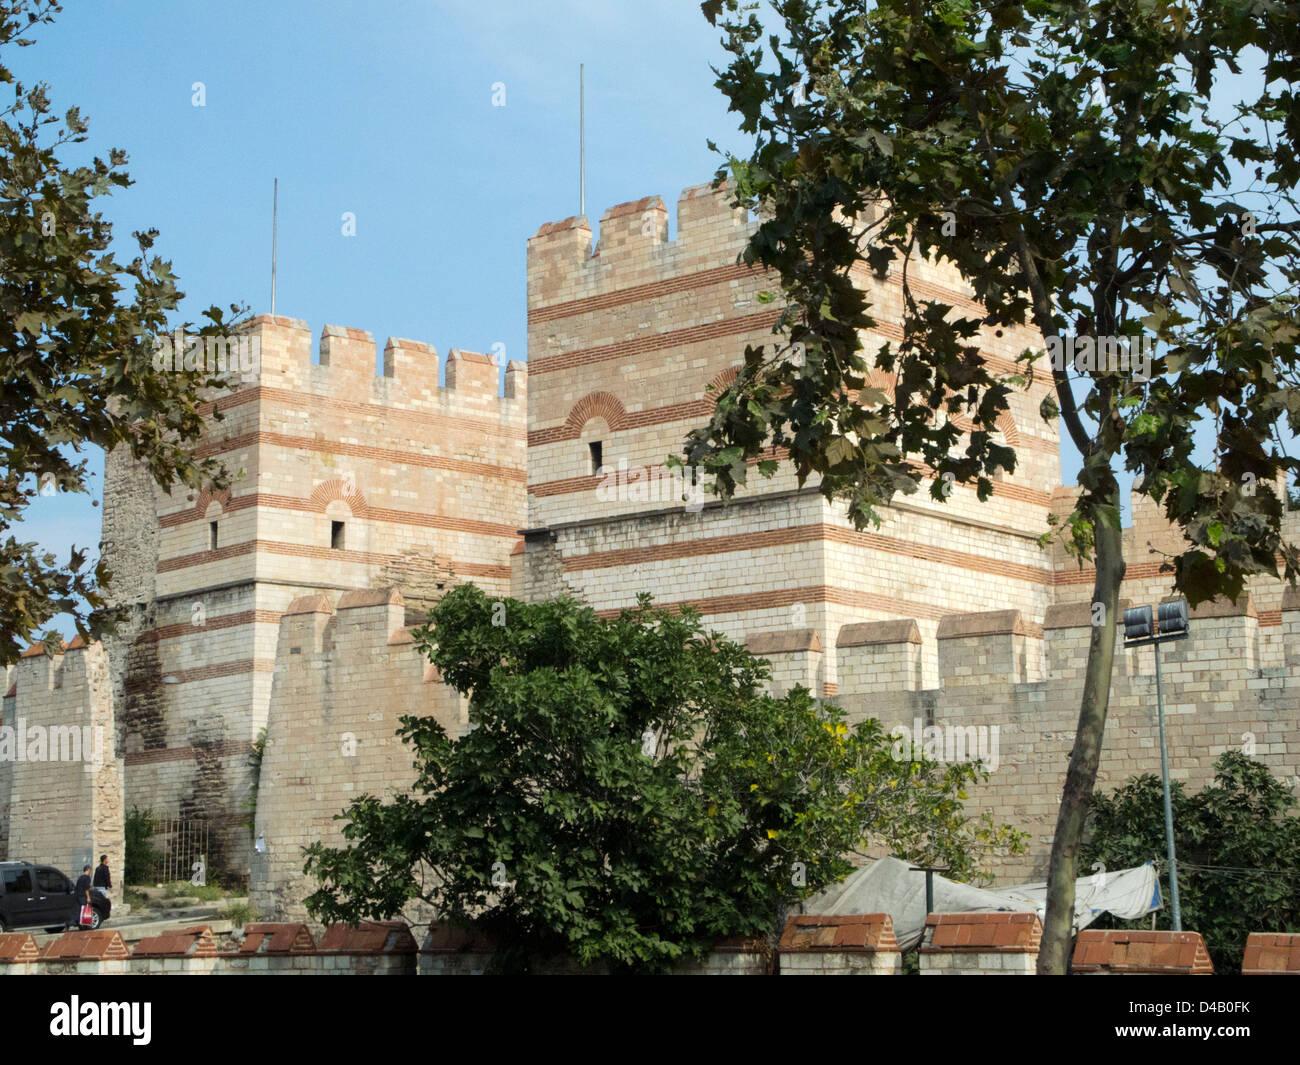 Türkei, Istanbul, Theodosianische Mauer, Stadtmauer beim Silivrikapi - Stock Image